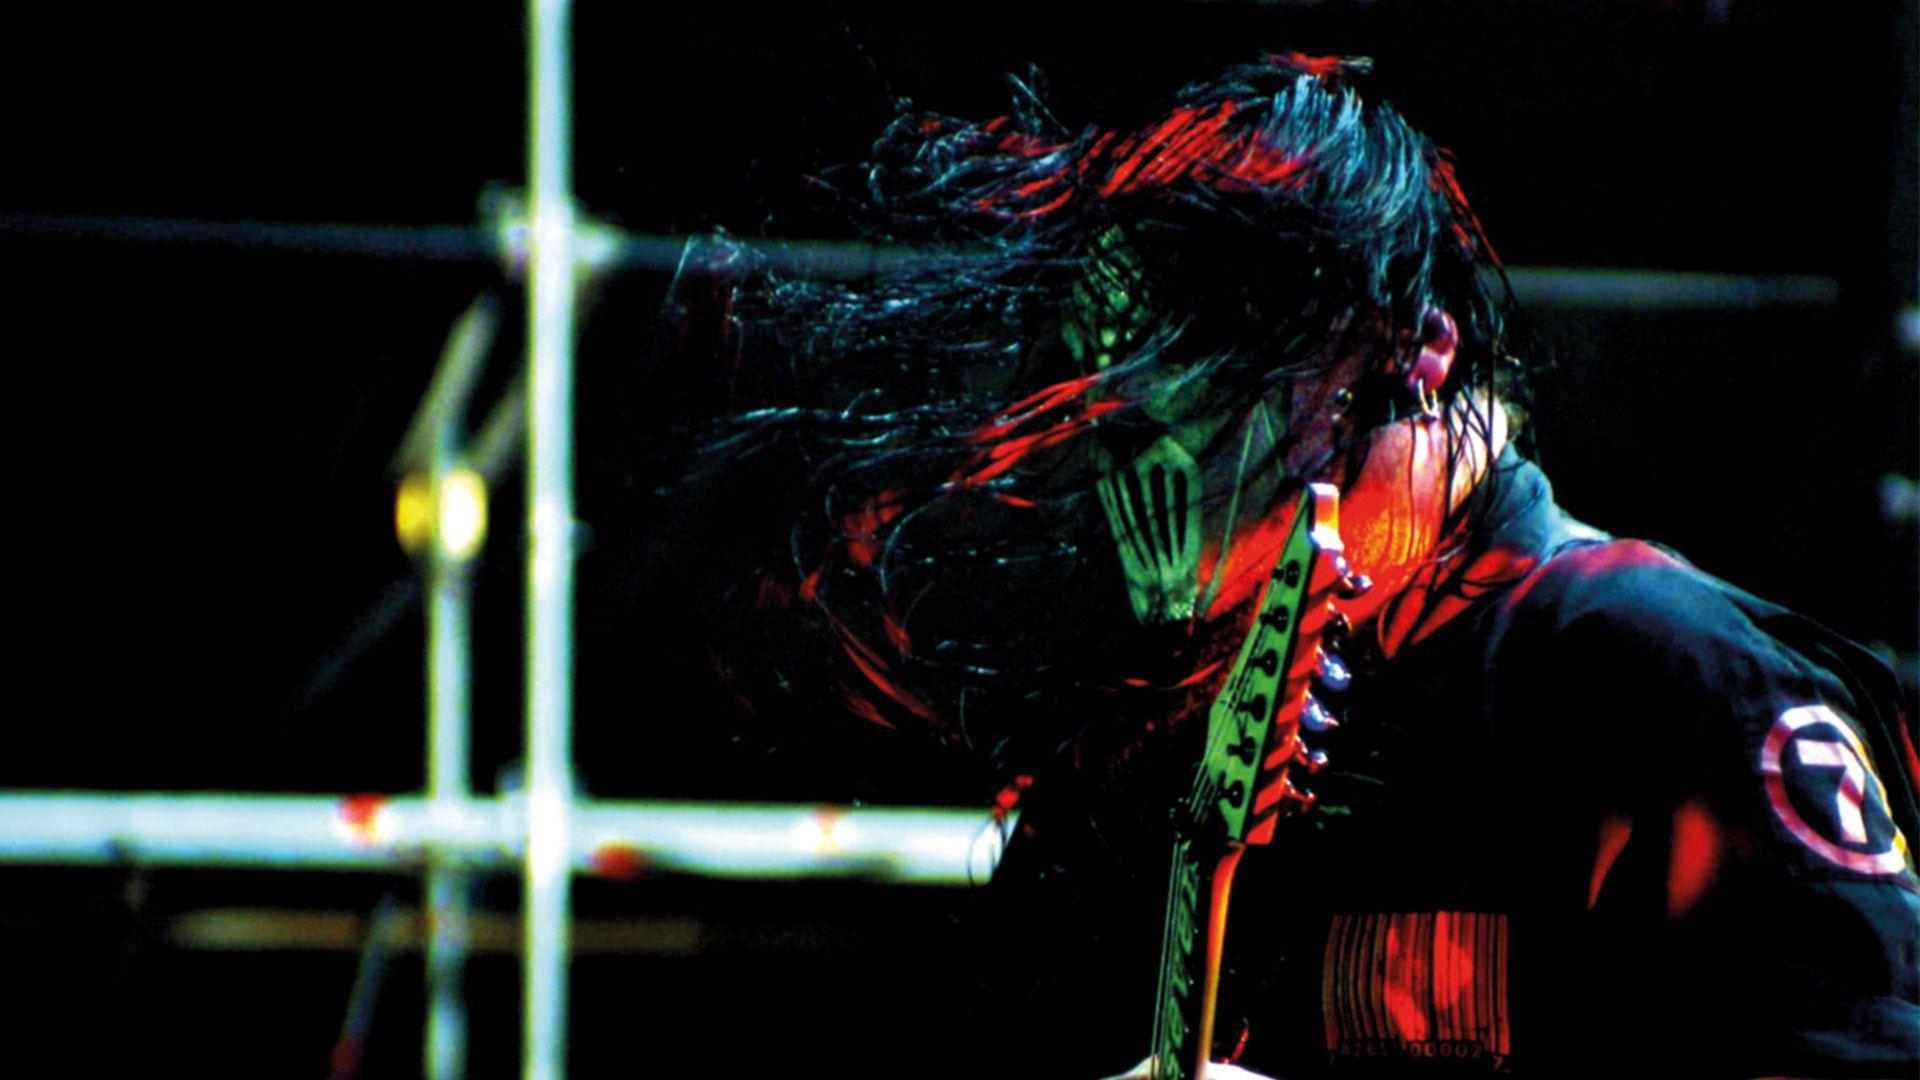 Concert de Slipknot - Day Of The Gusano, Live in Mexico visionnable gratuitement